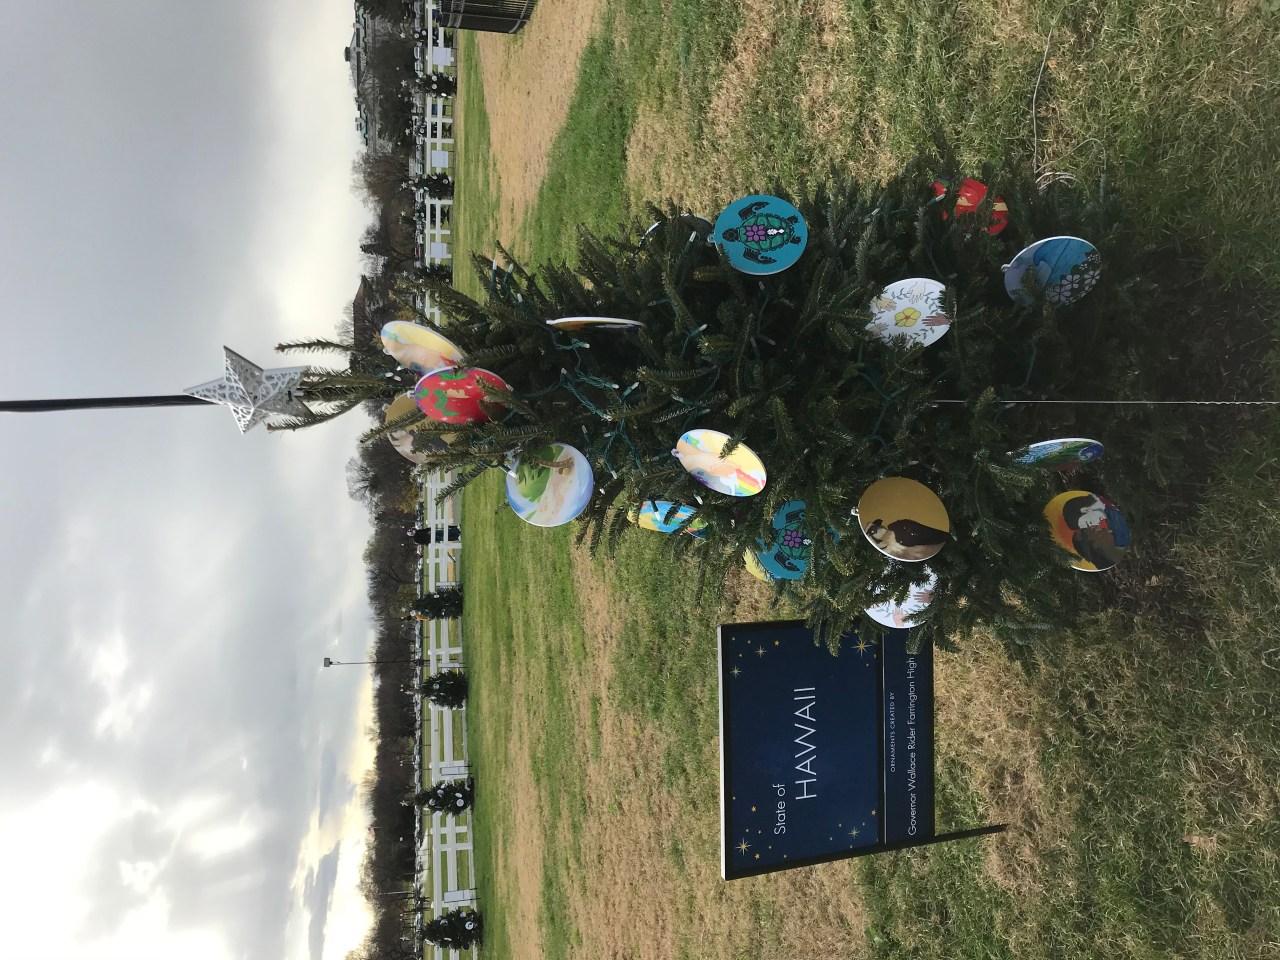 2021 Maui Christmas Ornaments Farrington High Students Design Christmas Ornaments For Hawaii Tree In Nation S Capitol Khon2